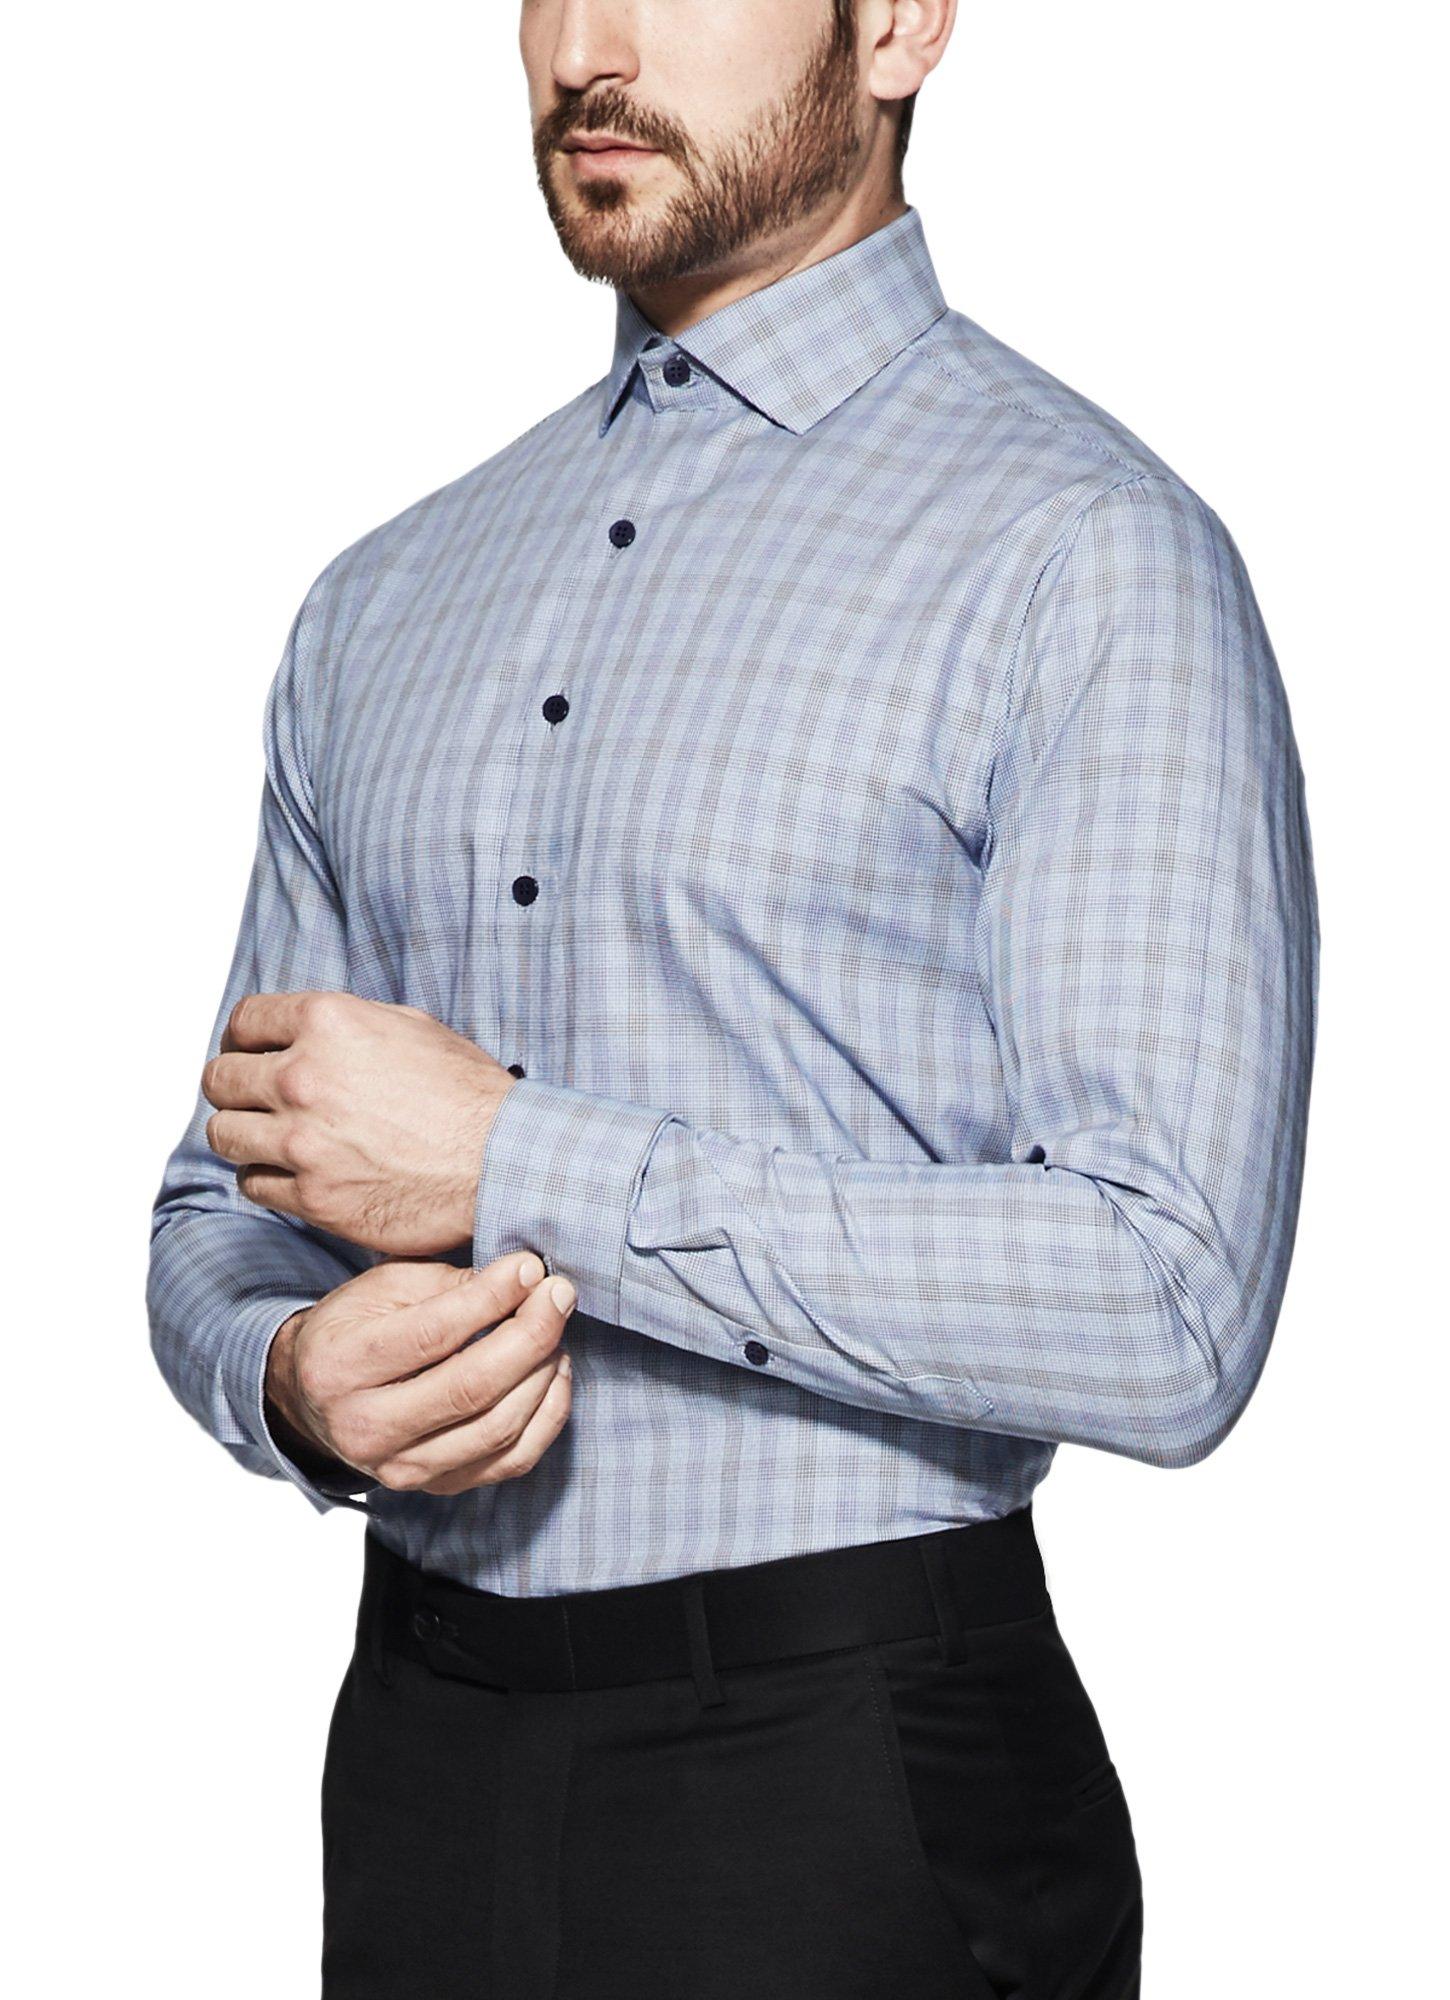 Vardama Men's Blue Checks Performance Shirt With Spill Proof Tech Mercer (X-Large)